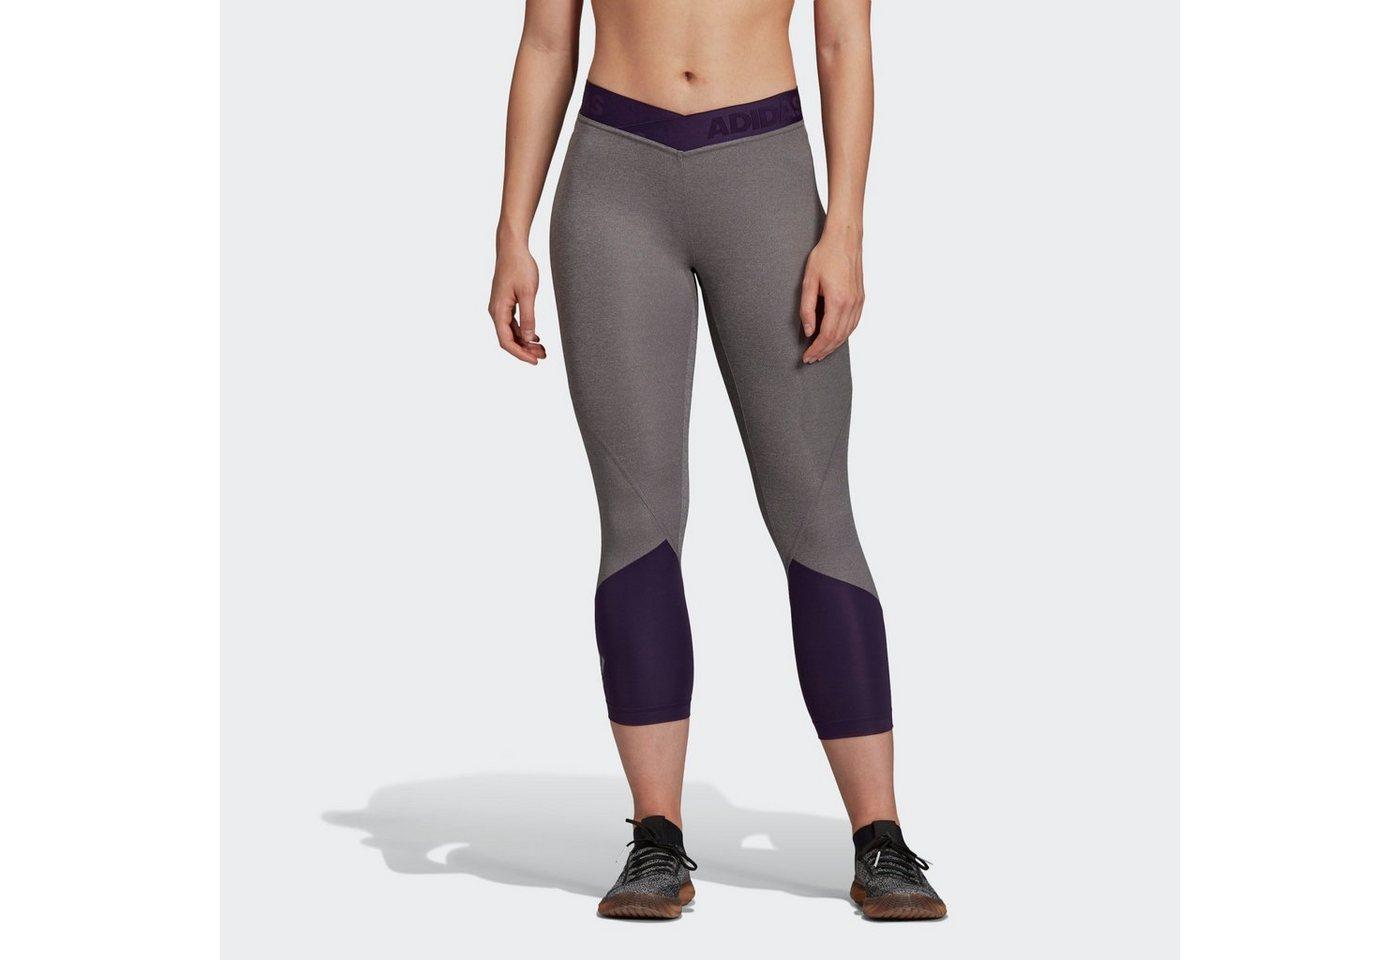 Damen adidas Performance Funktionstights »Alphaskin Sport 2.0 Graphic 3/4-Tight« AlphaSkin    04060515482865